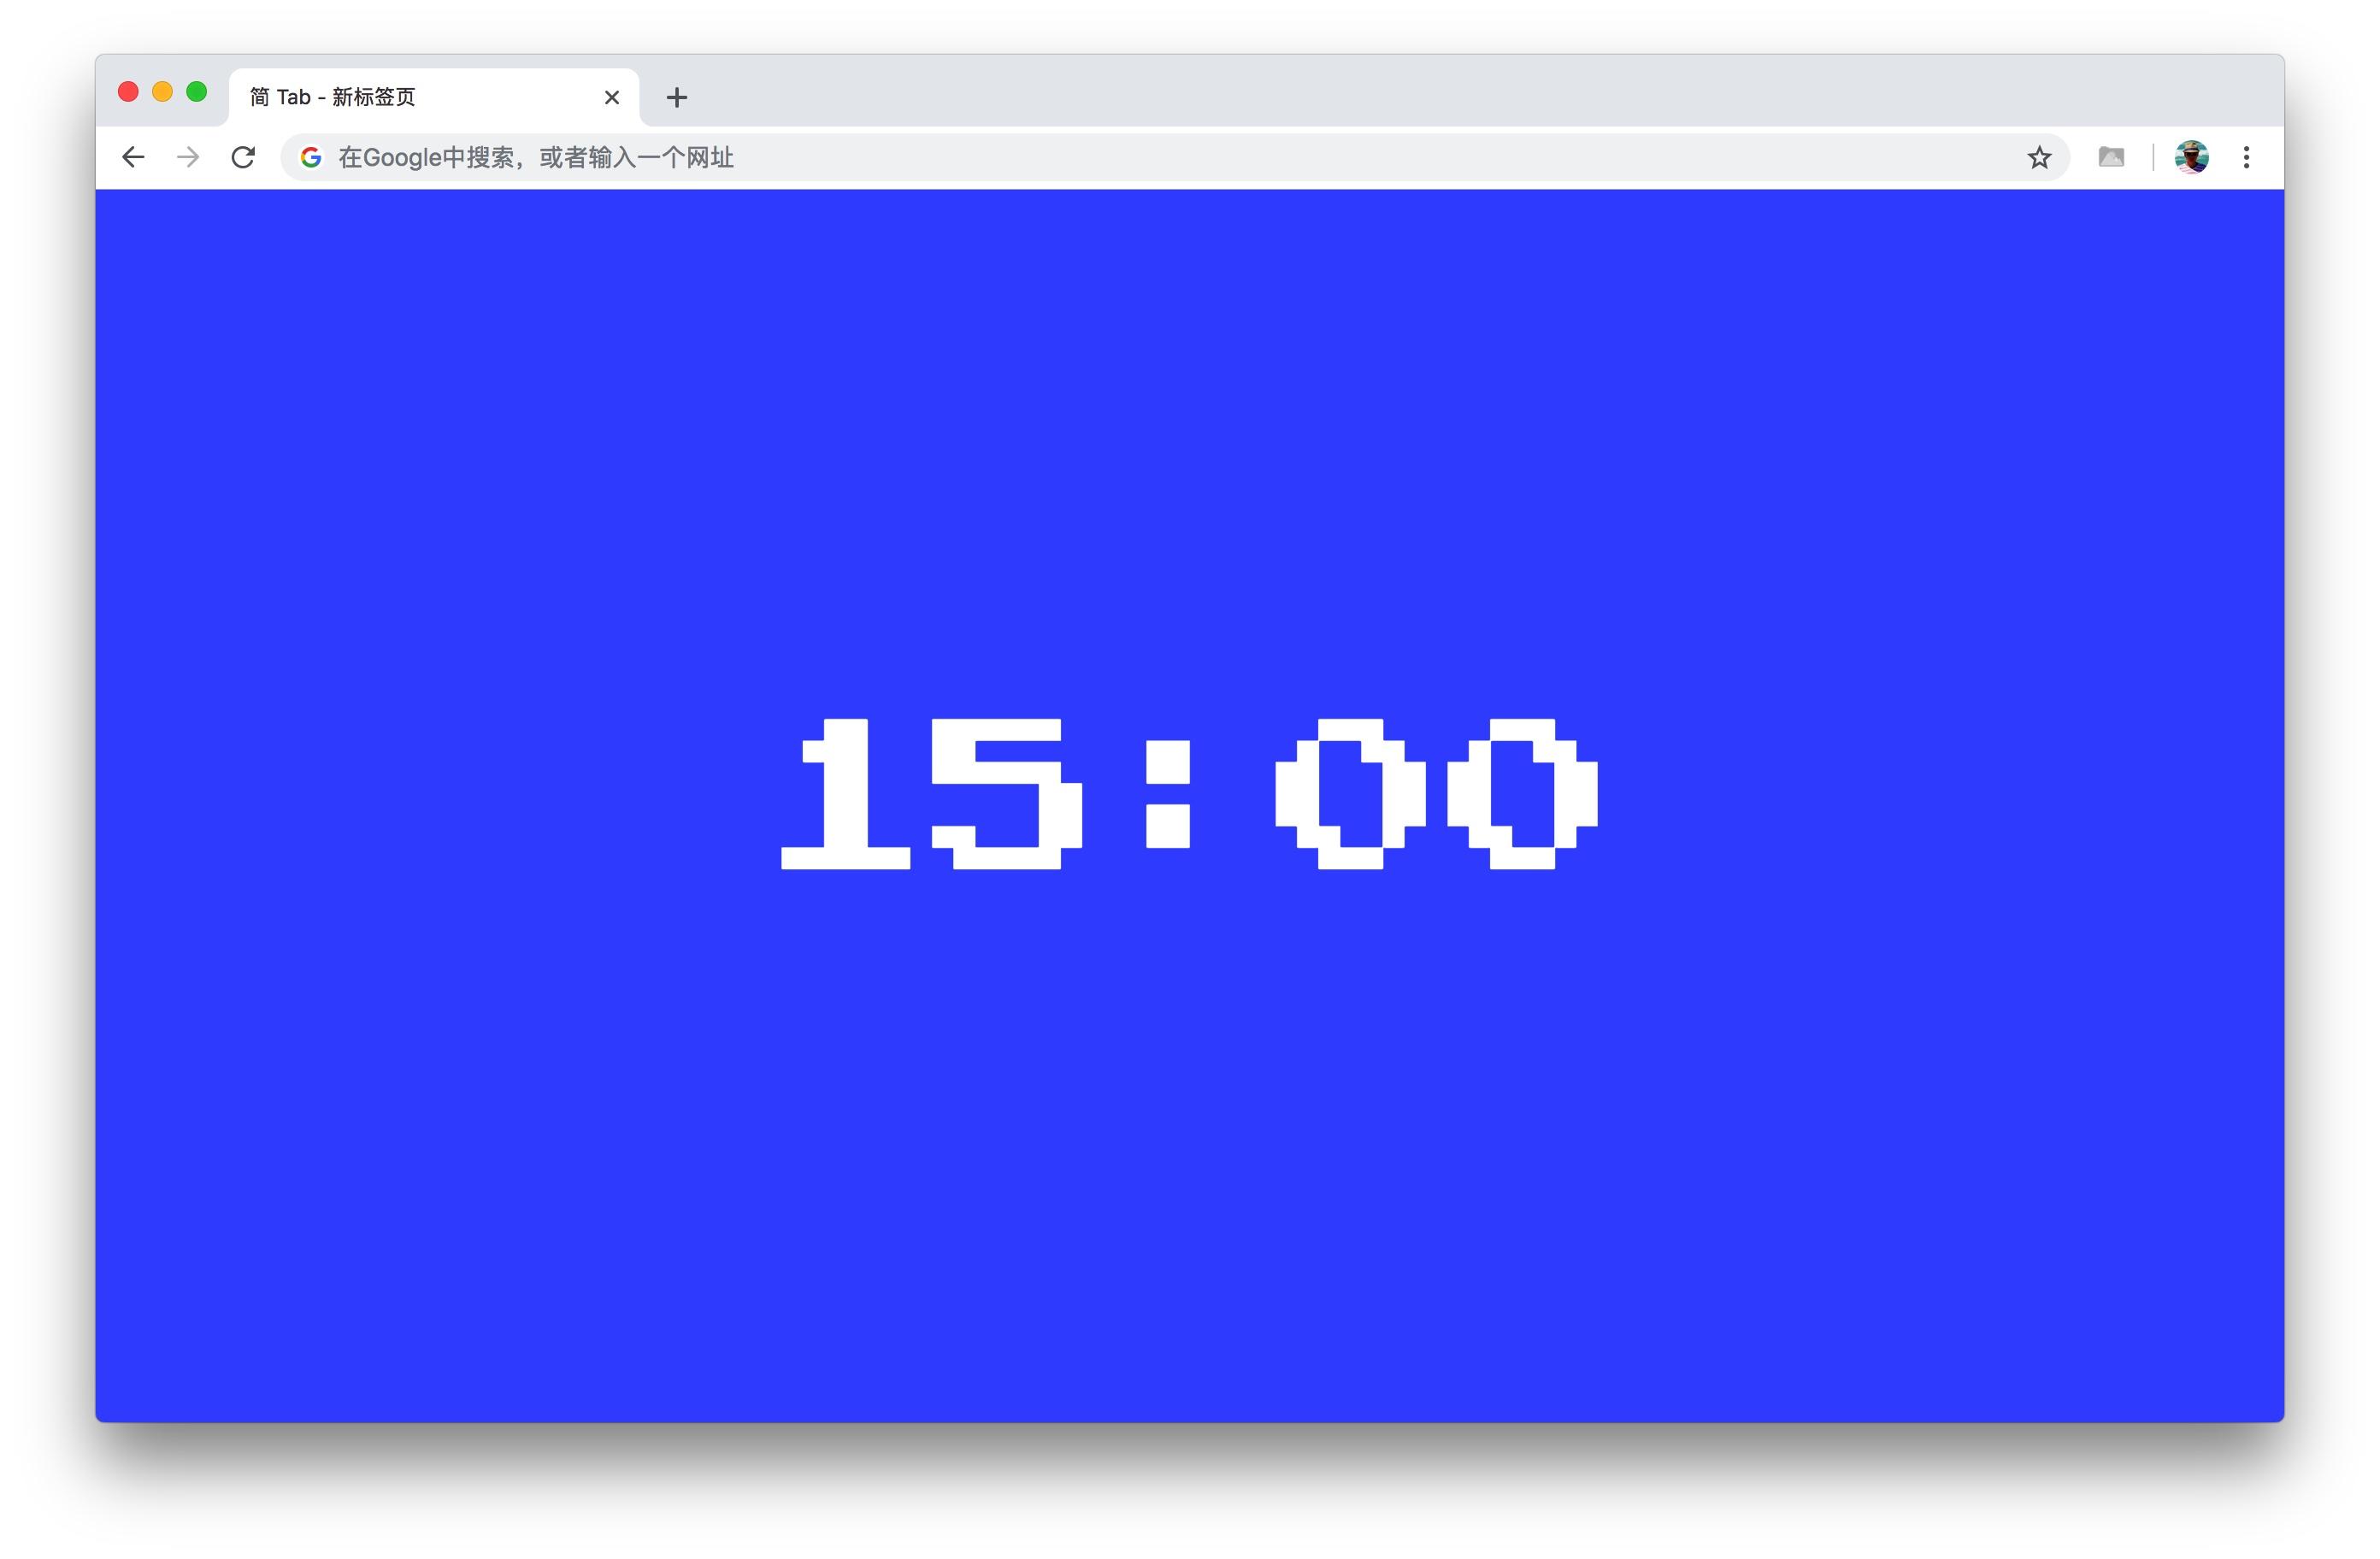 Xnip2018-11-23_15-01-16.jpg